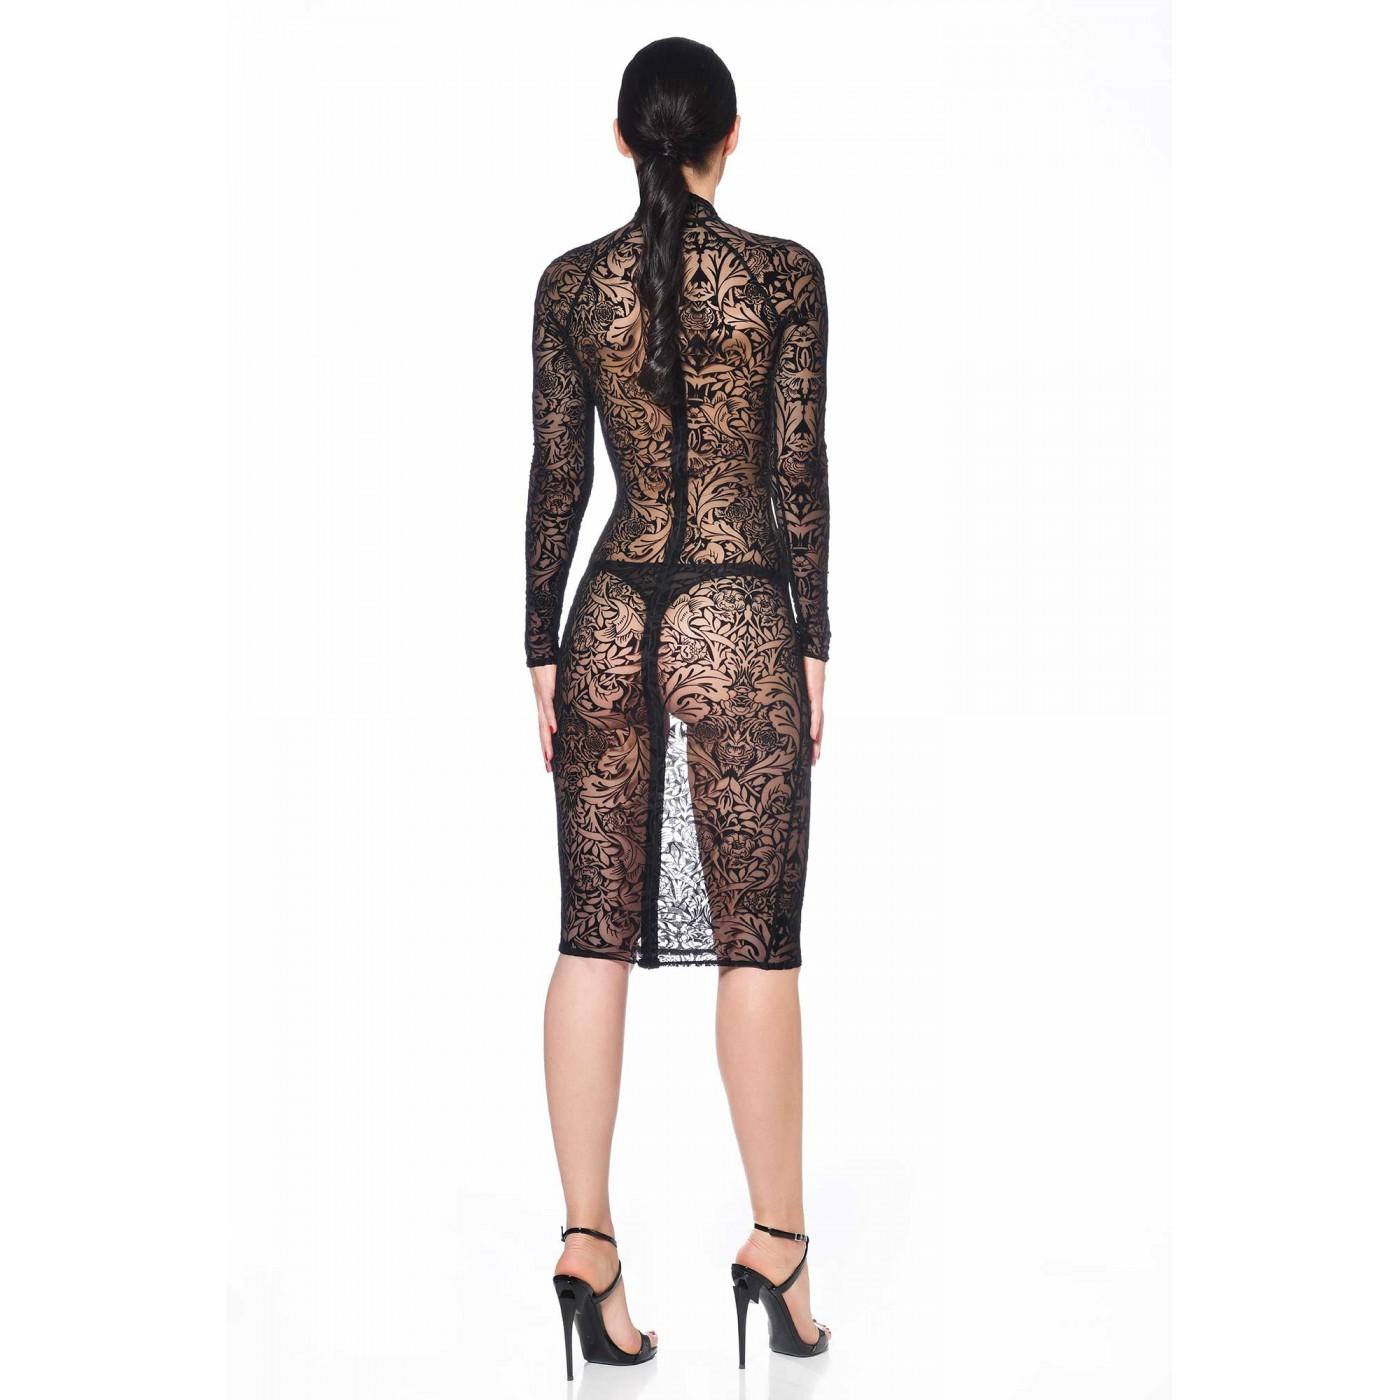 Azia, maori black mesh dress - Patrice Catanzaro